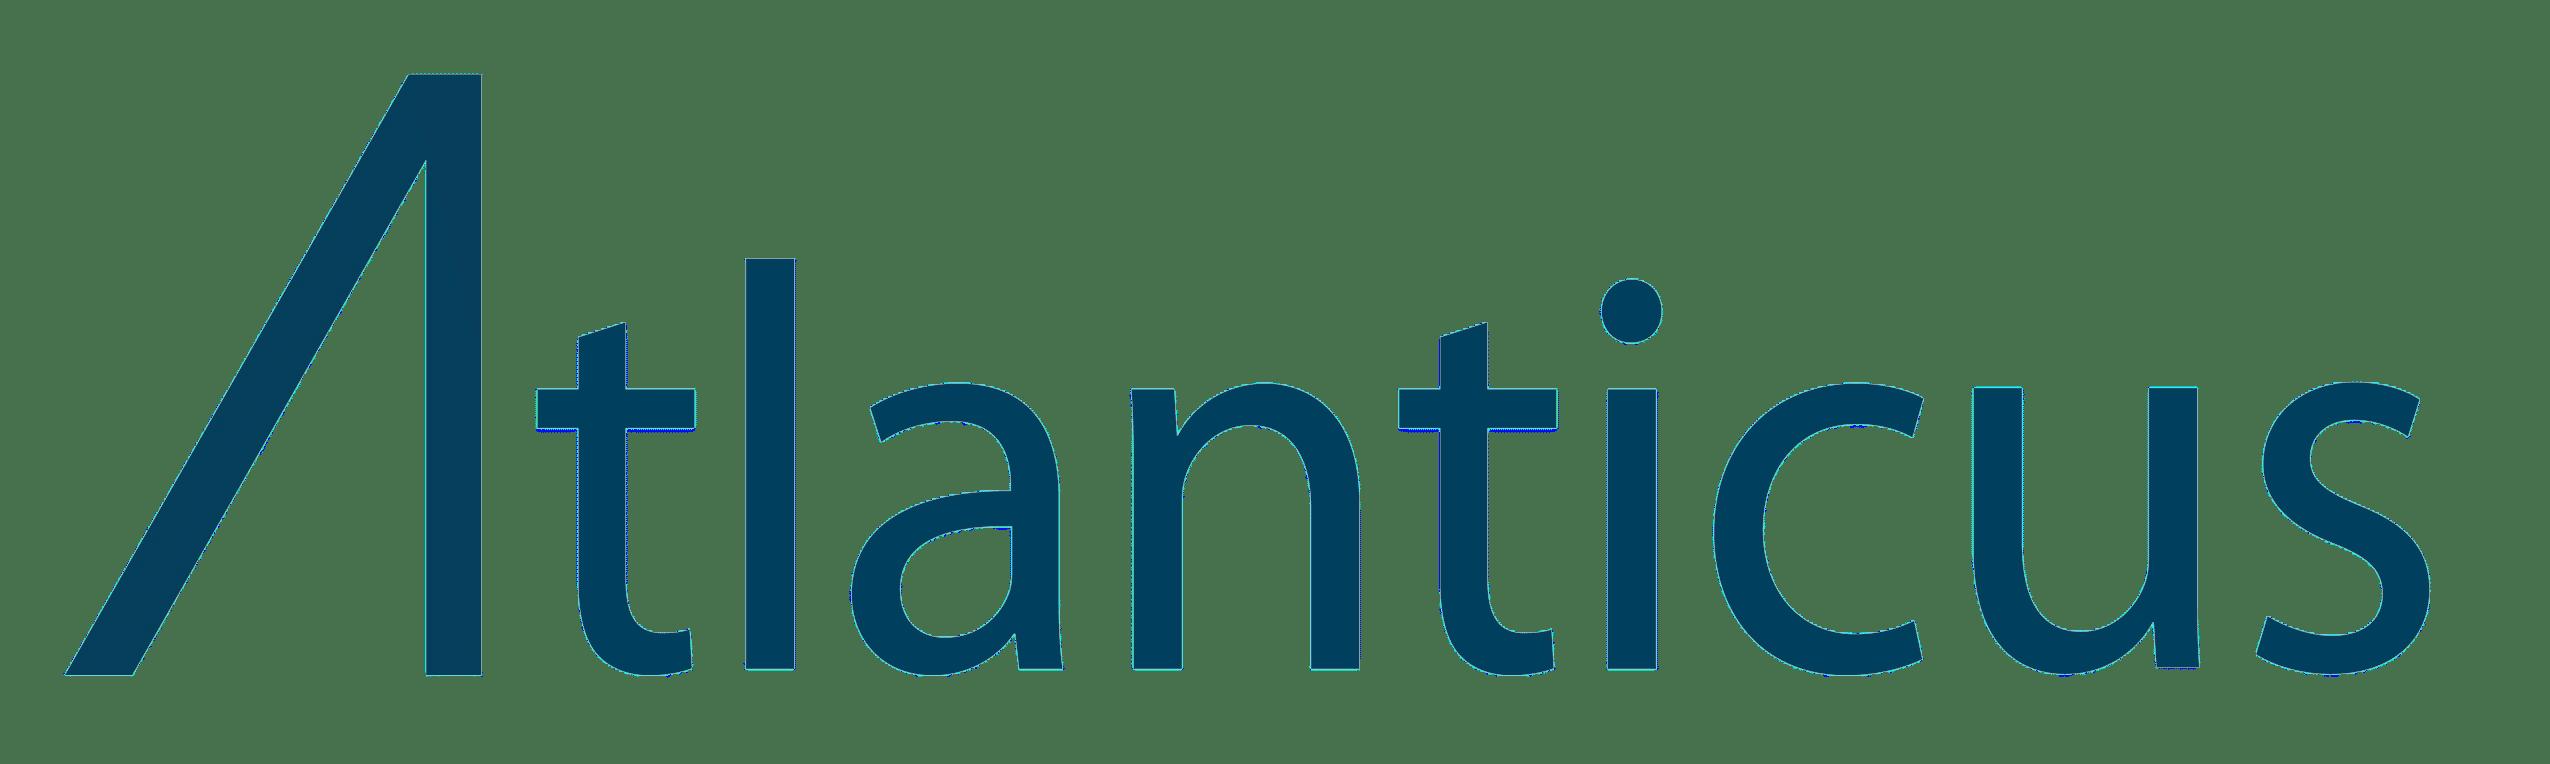 Atlanticus company logo